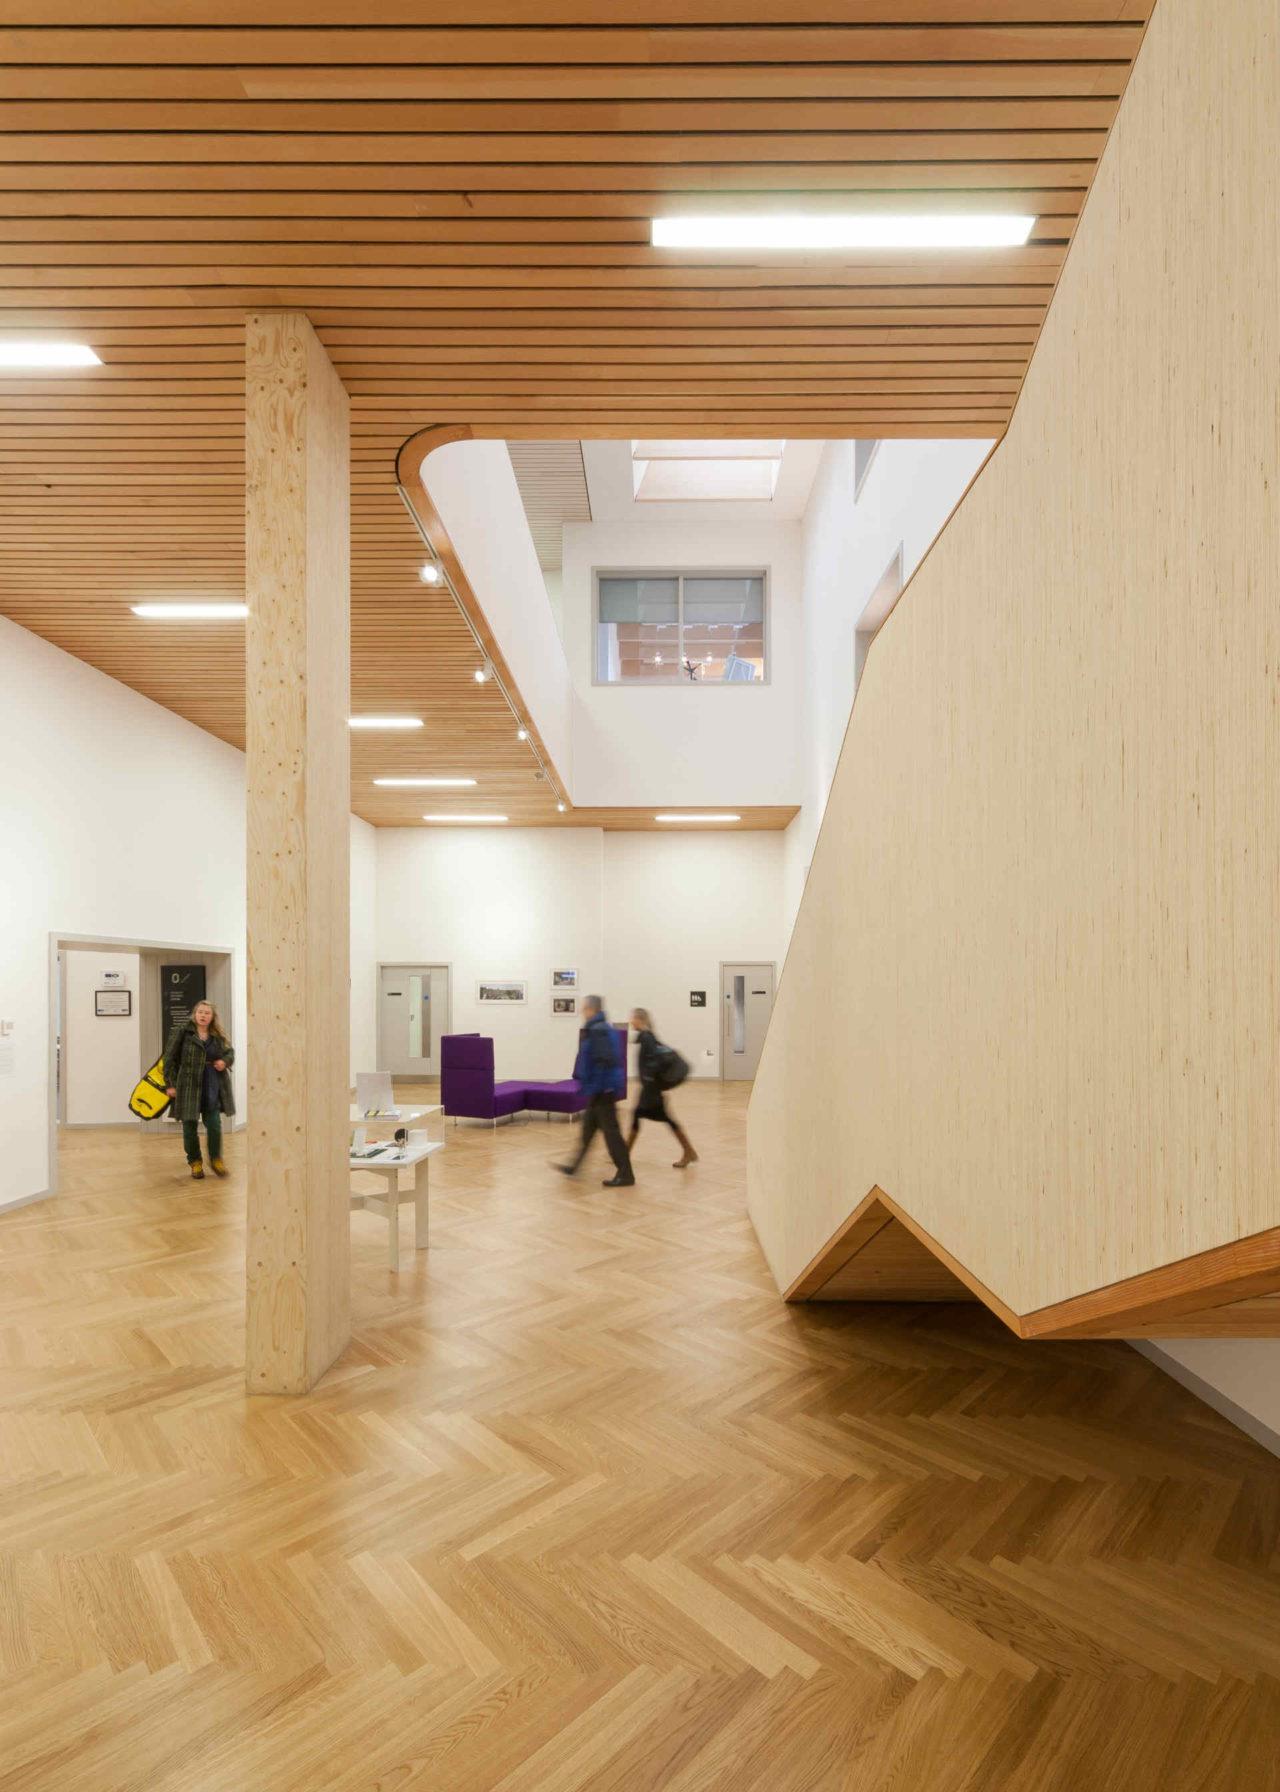 WFG- Edinburgh Centre for Carbon Innovation- by Malcolm Fraser Architects- for University of Edinburgh (Natural Building Technoligies) (June 2018) (8) 1